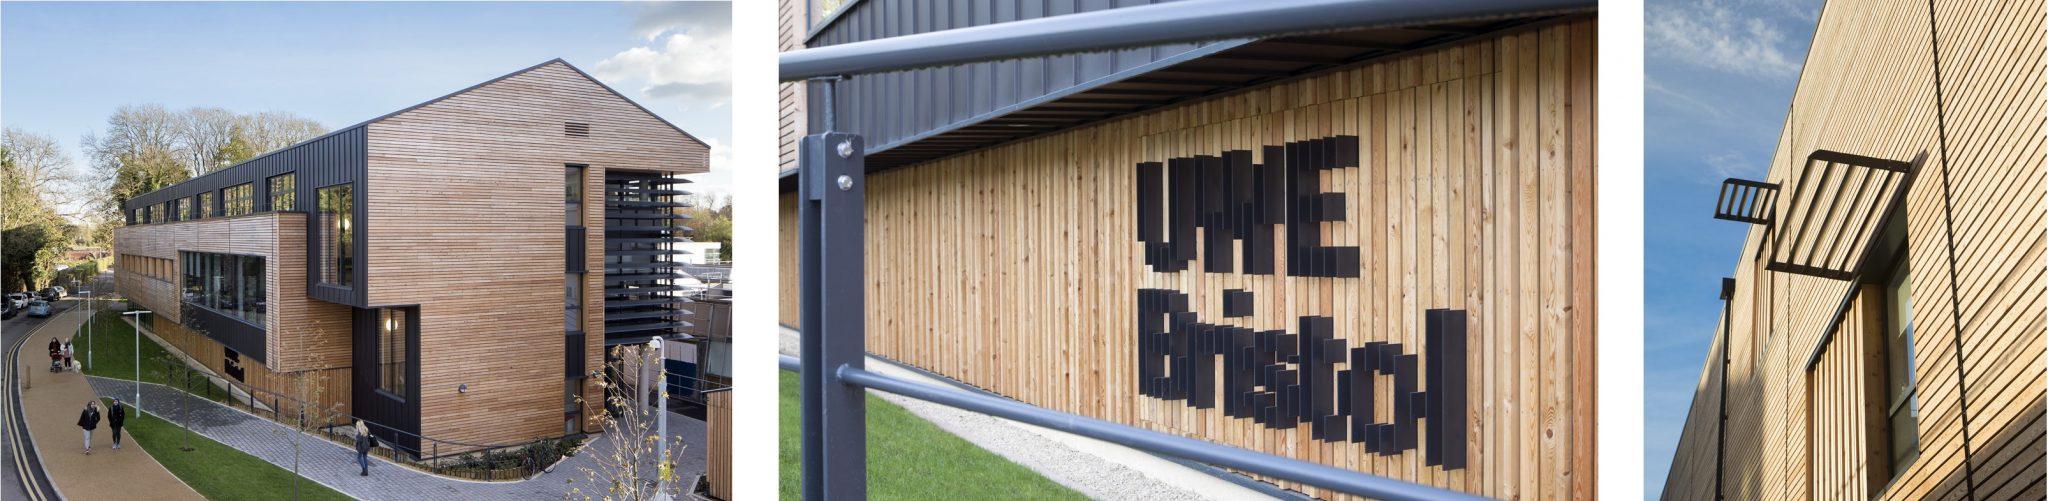 University West of England Collage